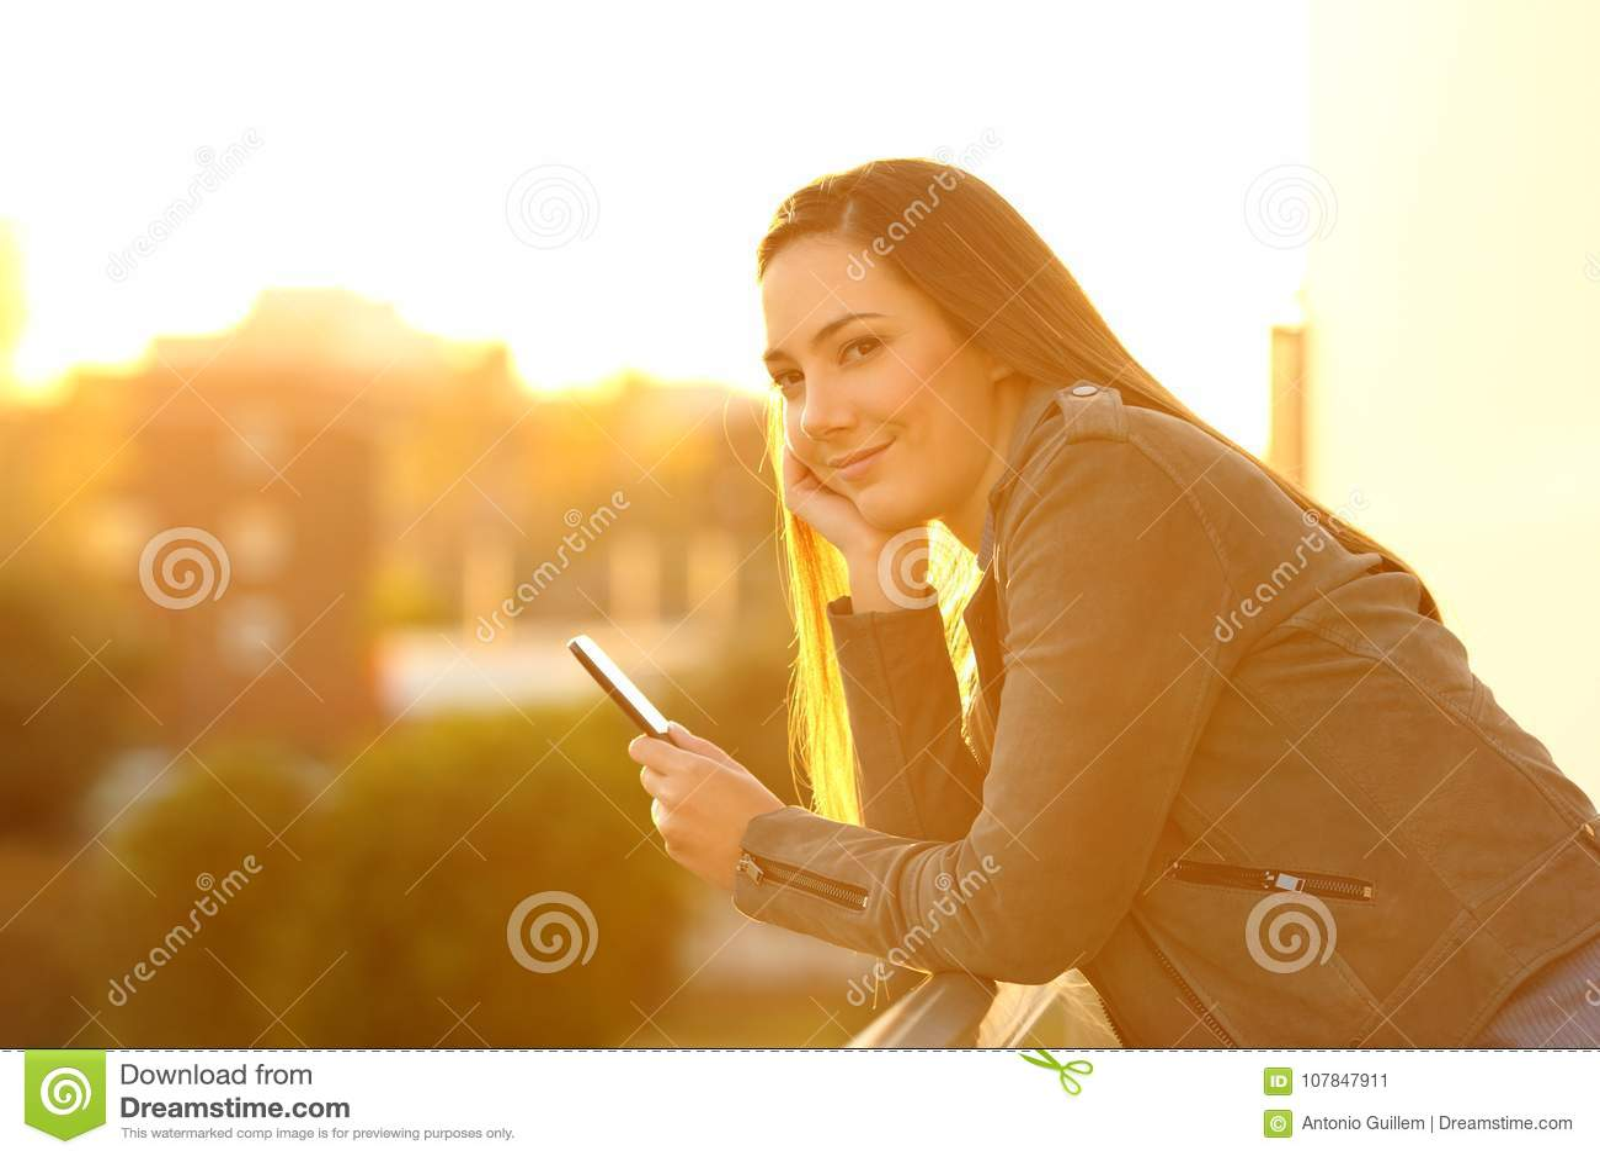 Fashion girl holding a phone looking at camera at sunset